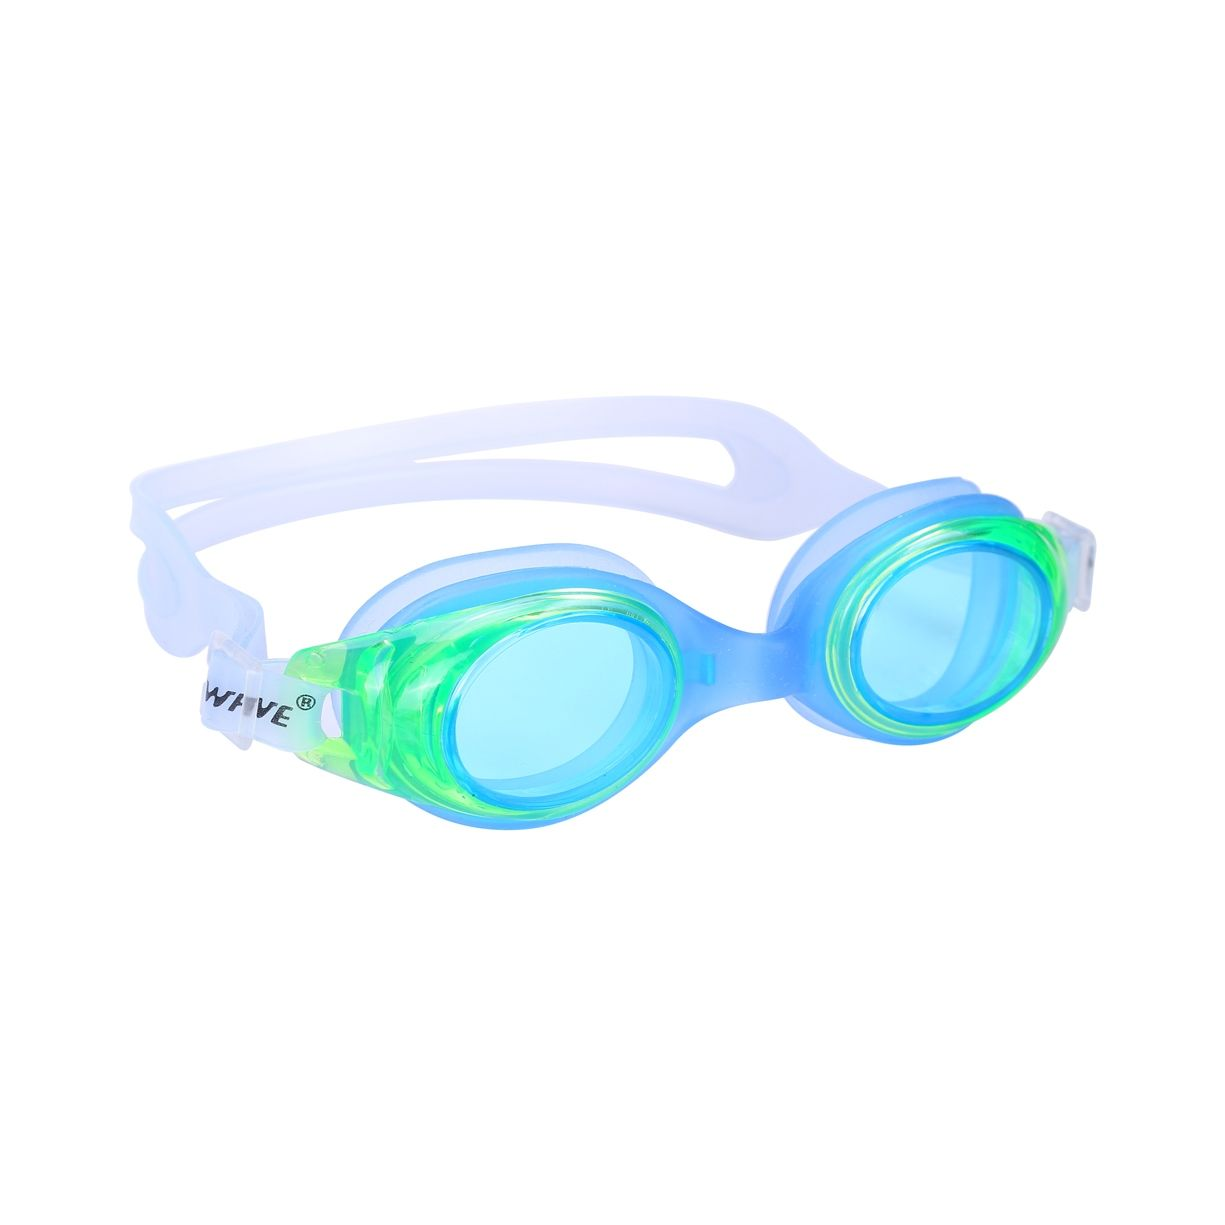 d31958994d wave-china.com We have a wide range of swim glasses